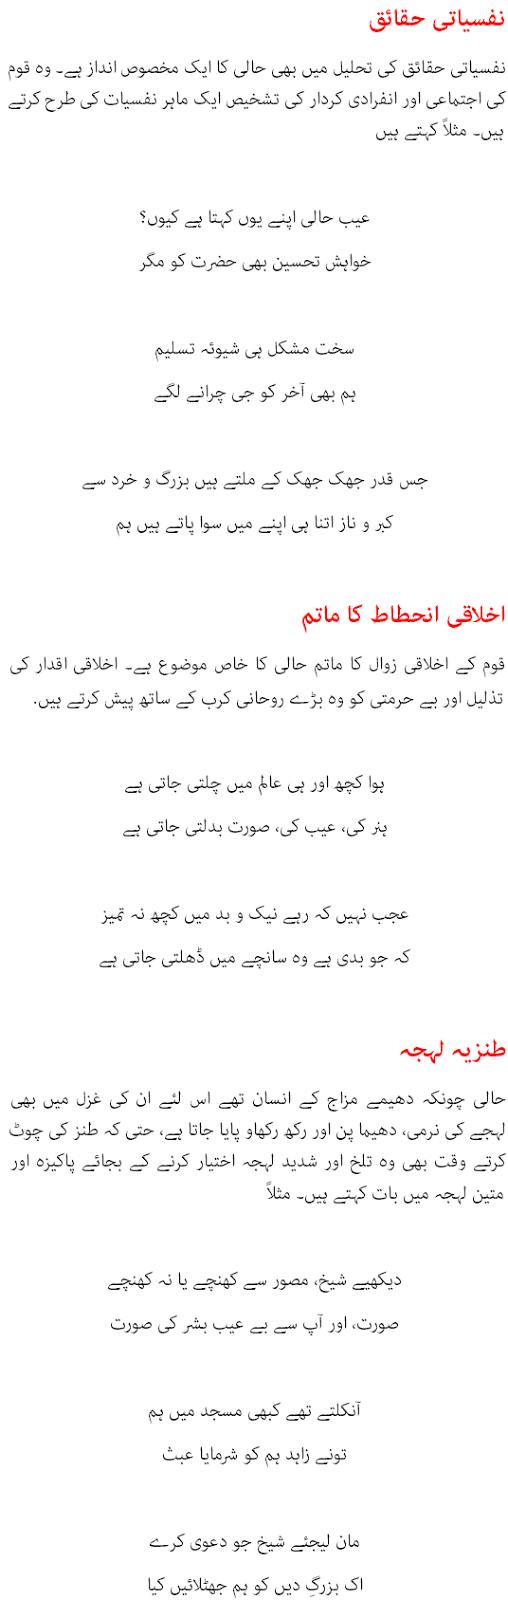 essay on altaf hussain hali Urdu nazams of khwaja altaf hussain hali خواجہ الطاف حسین حالی کی نظمیں, read best nazam collection of famous poet khwaja altaf hussain hali.